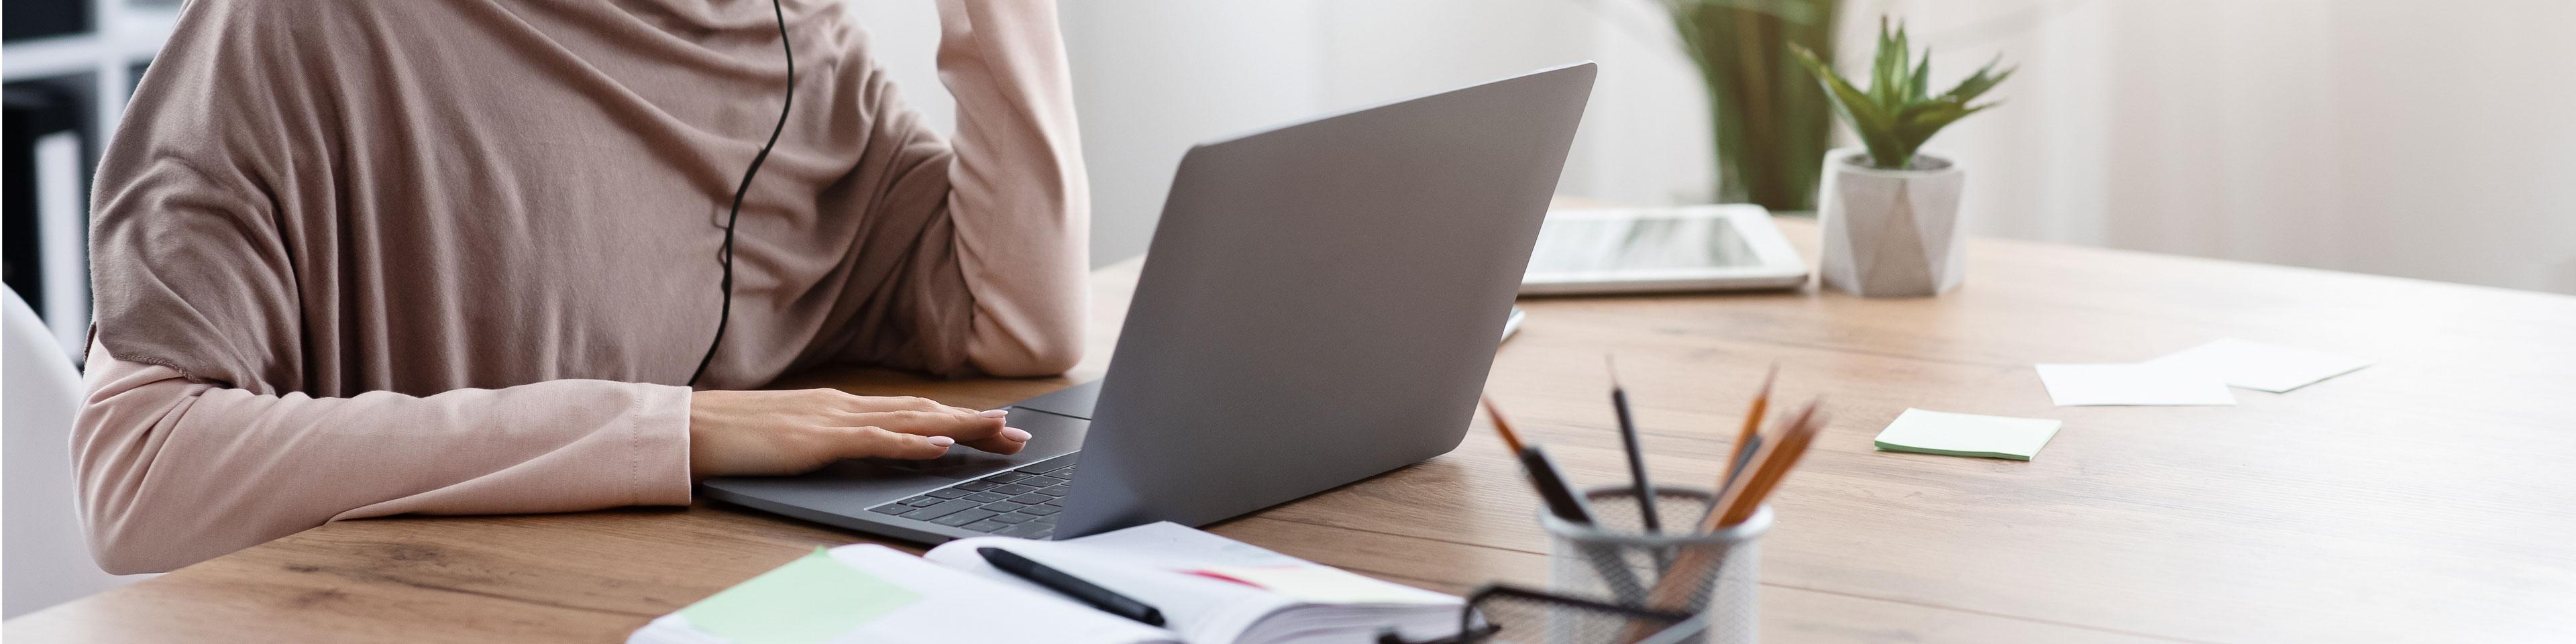 businesswoman laptop office